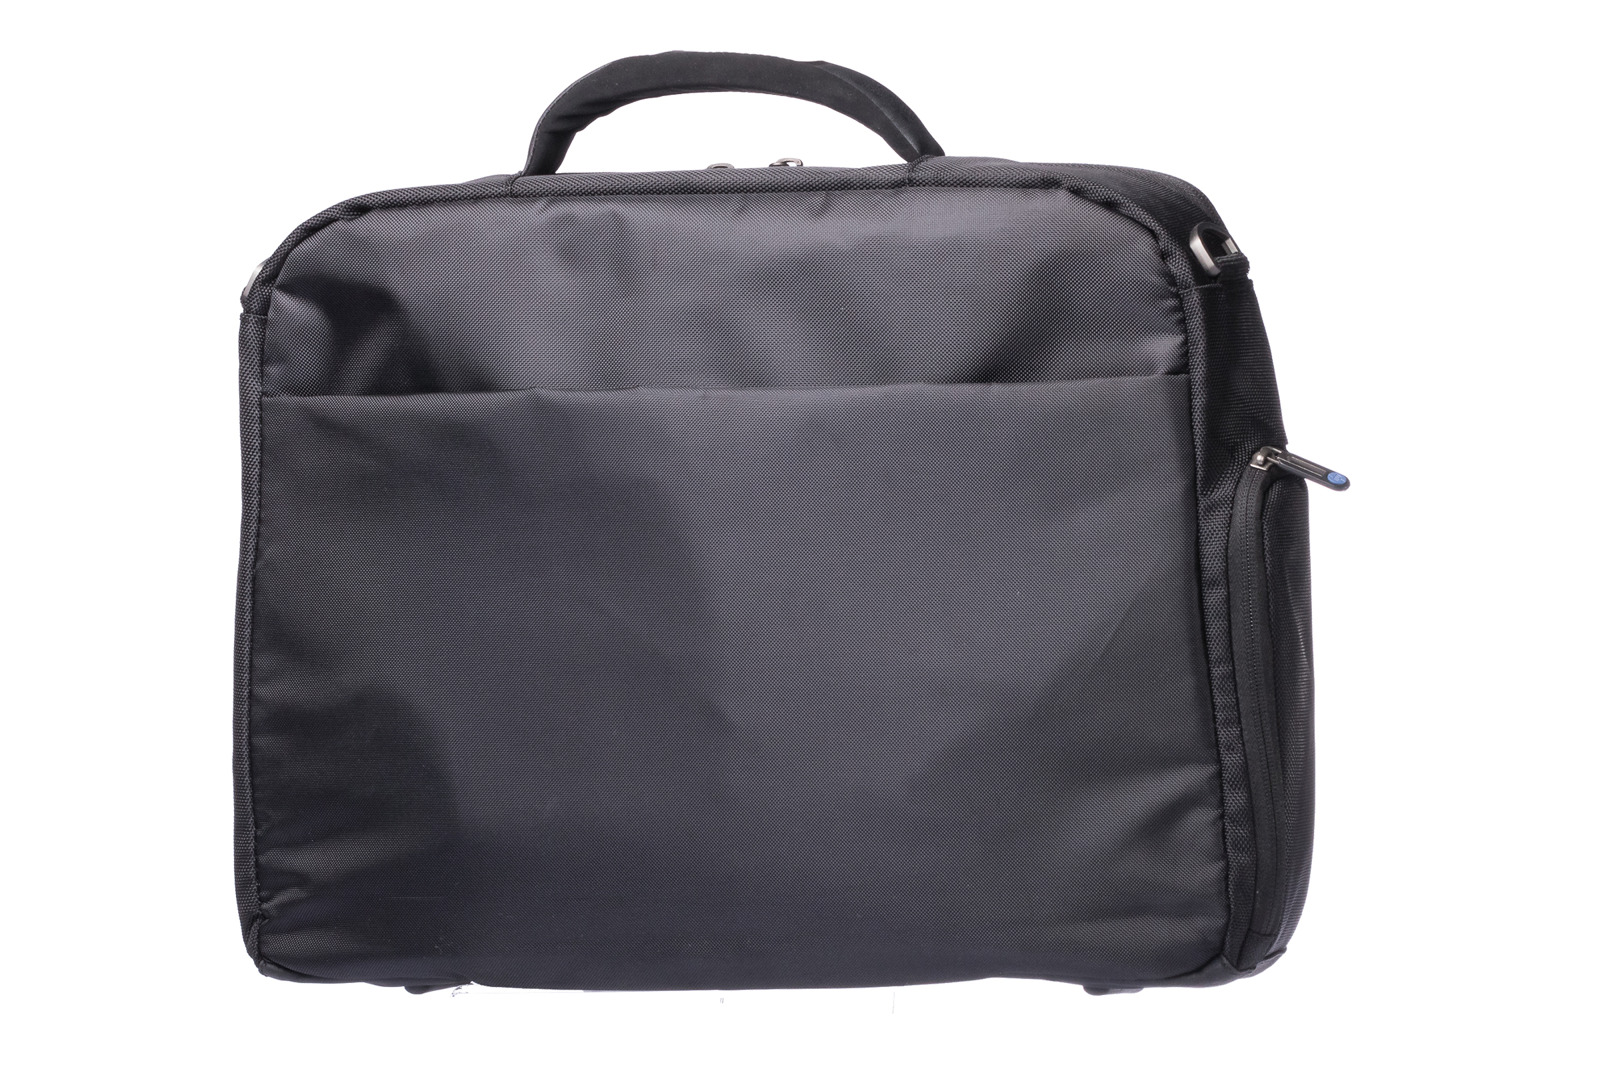 HP Professional Slim Top Load 17.3 Laptoptasche 592923-001